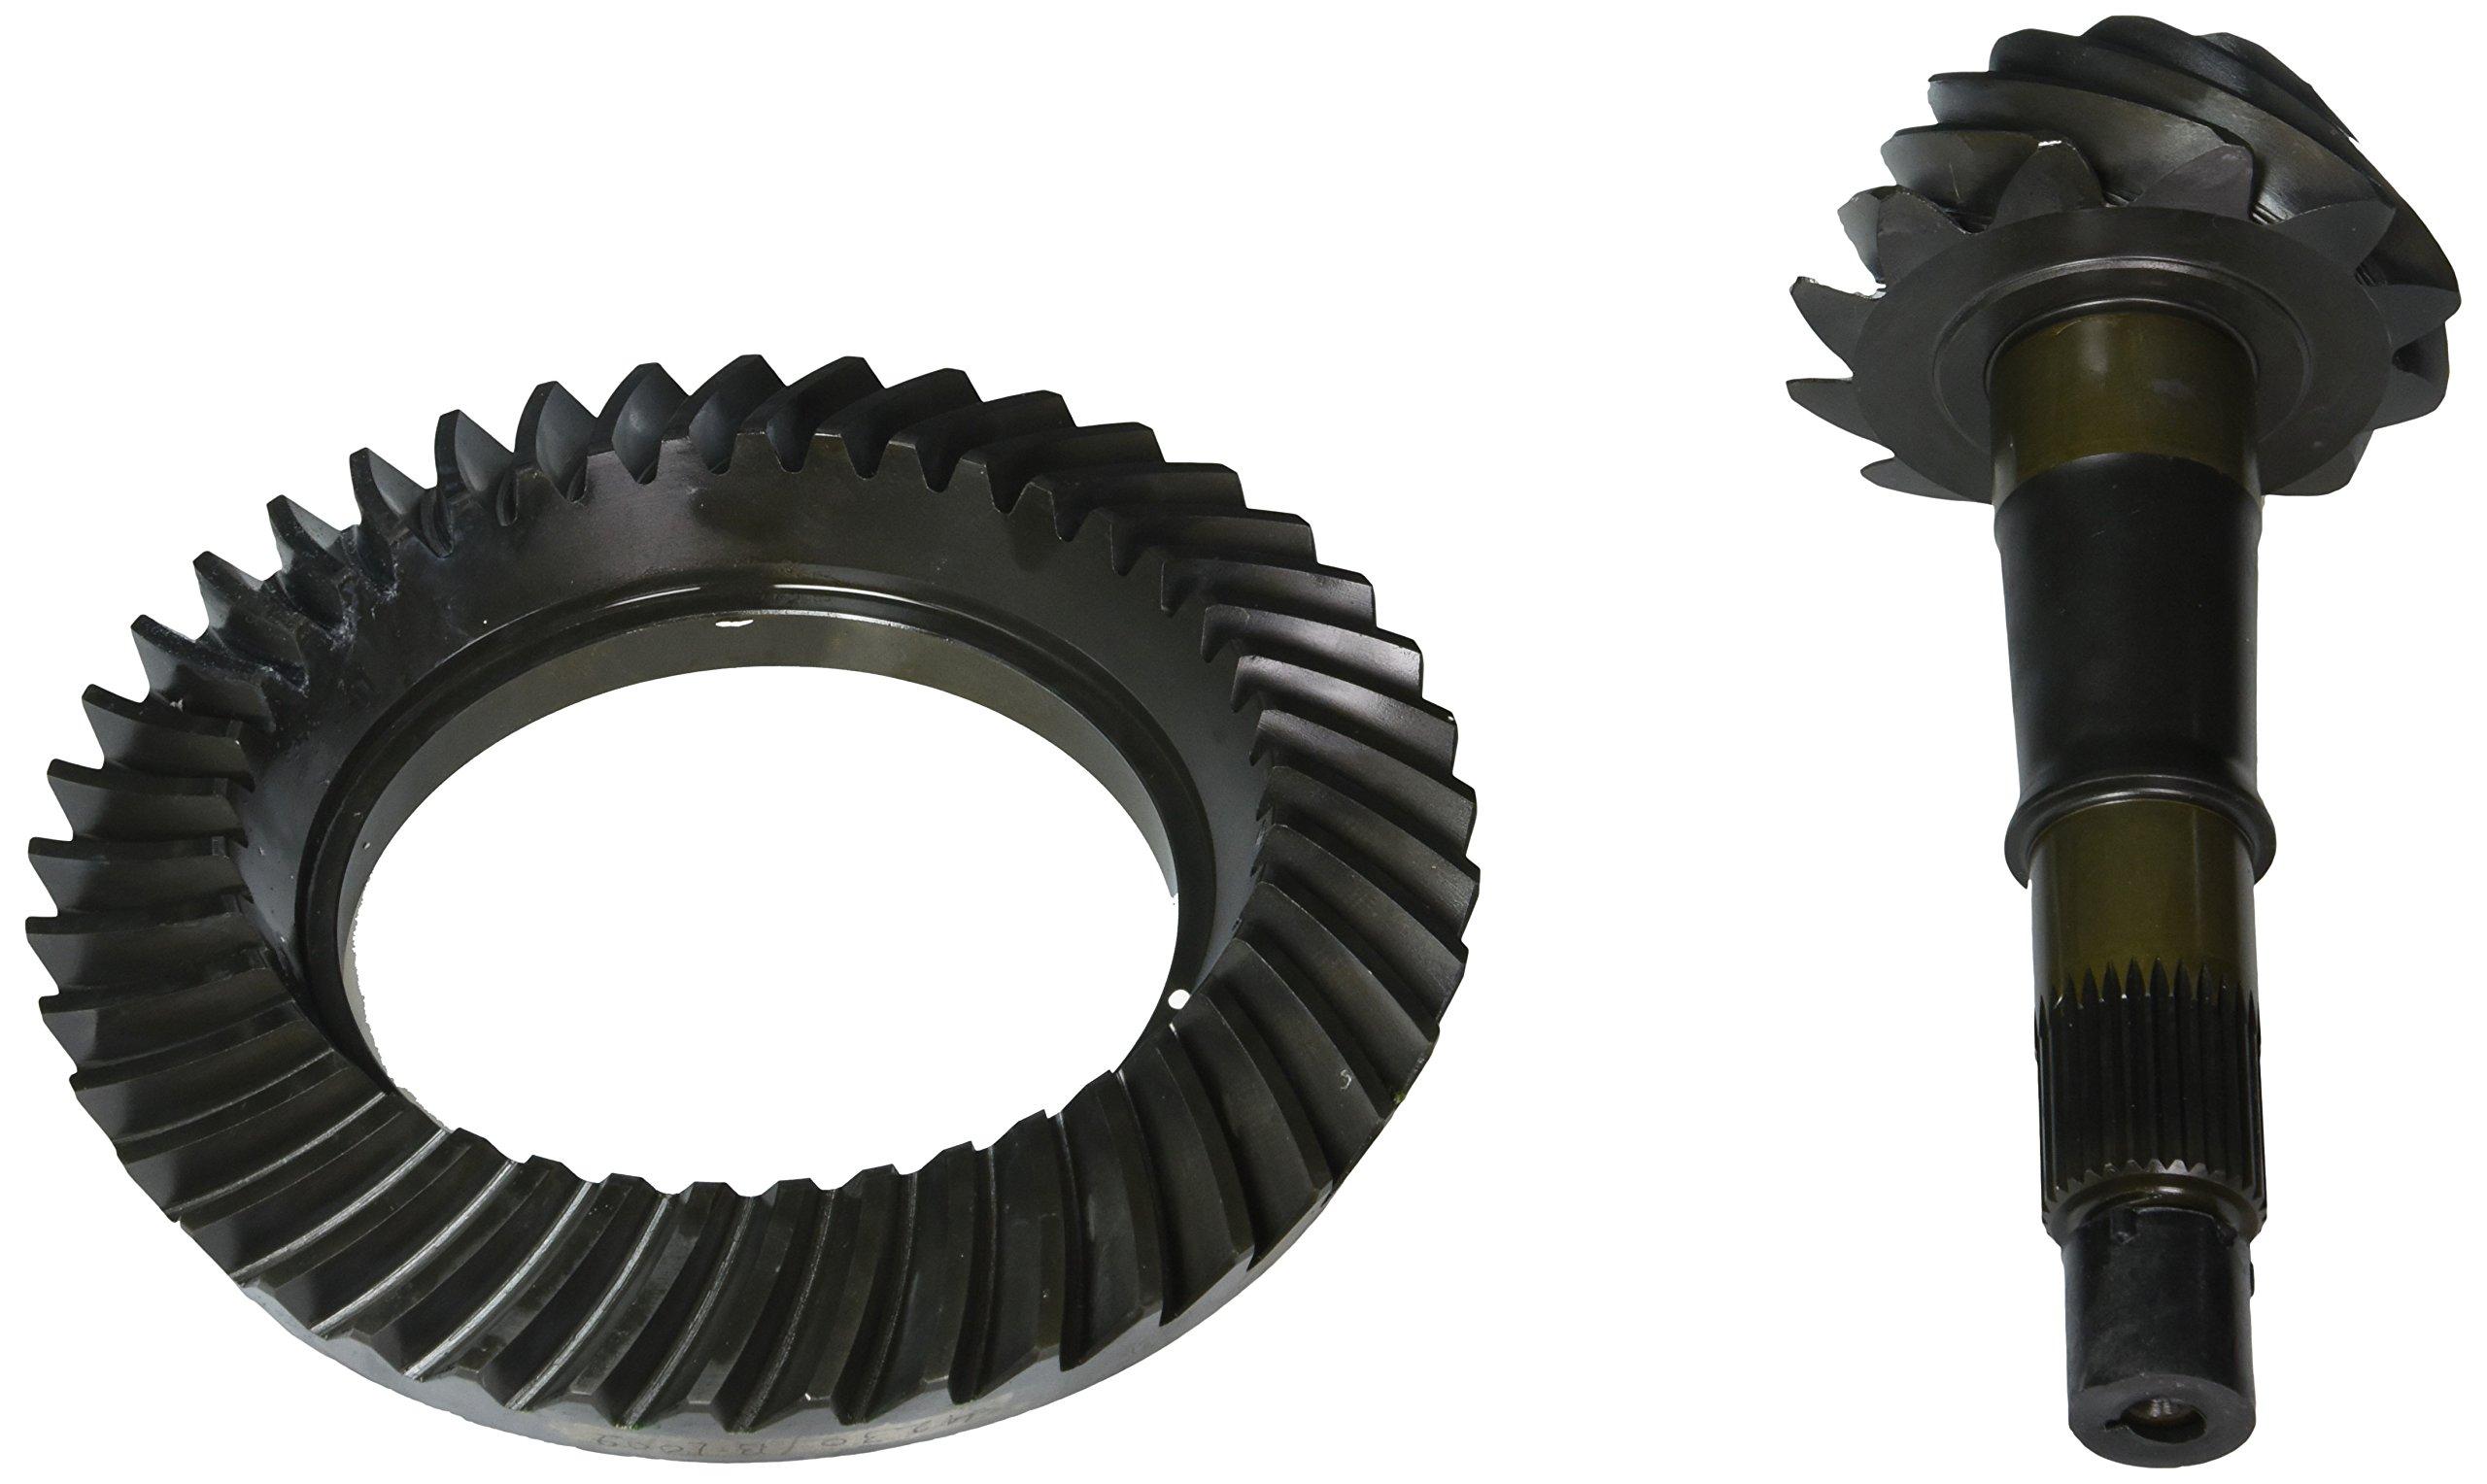 Richmond Gear GM85342 Gear Gm 10 8.5'''' 3.42''